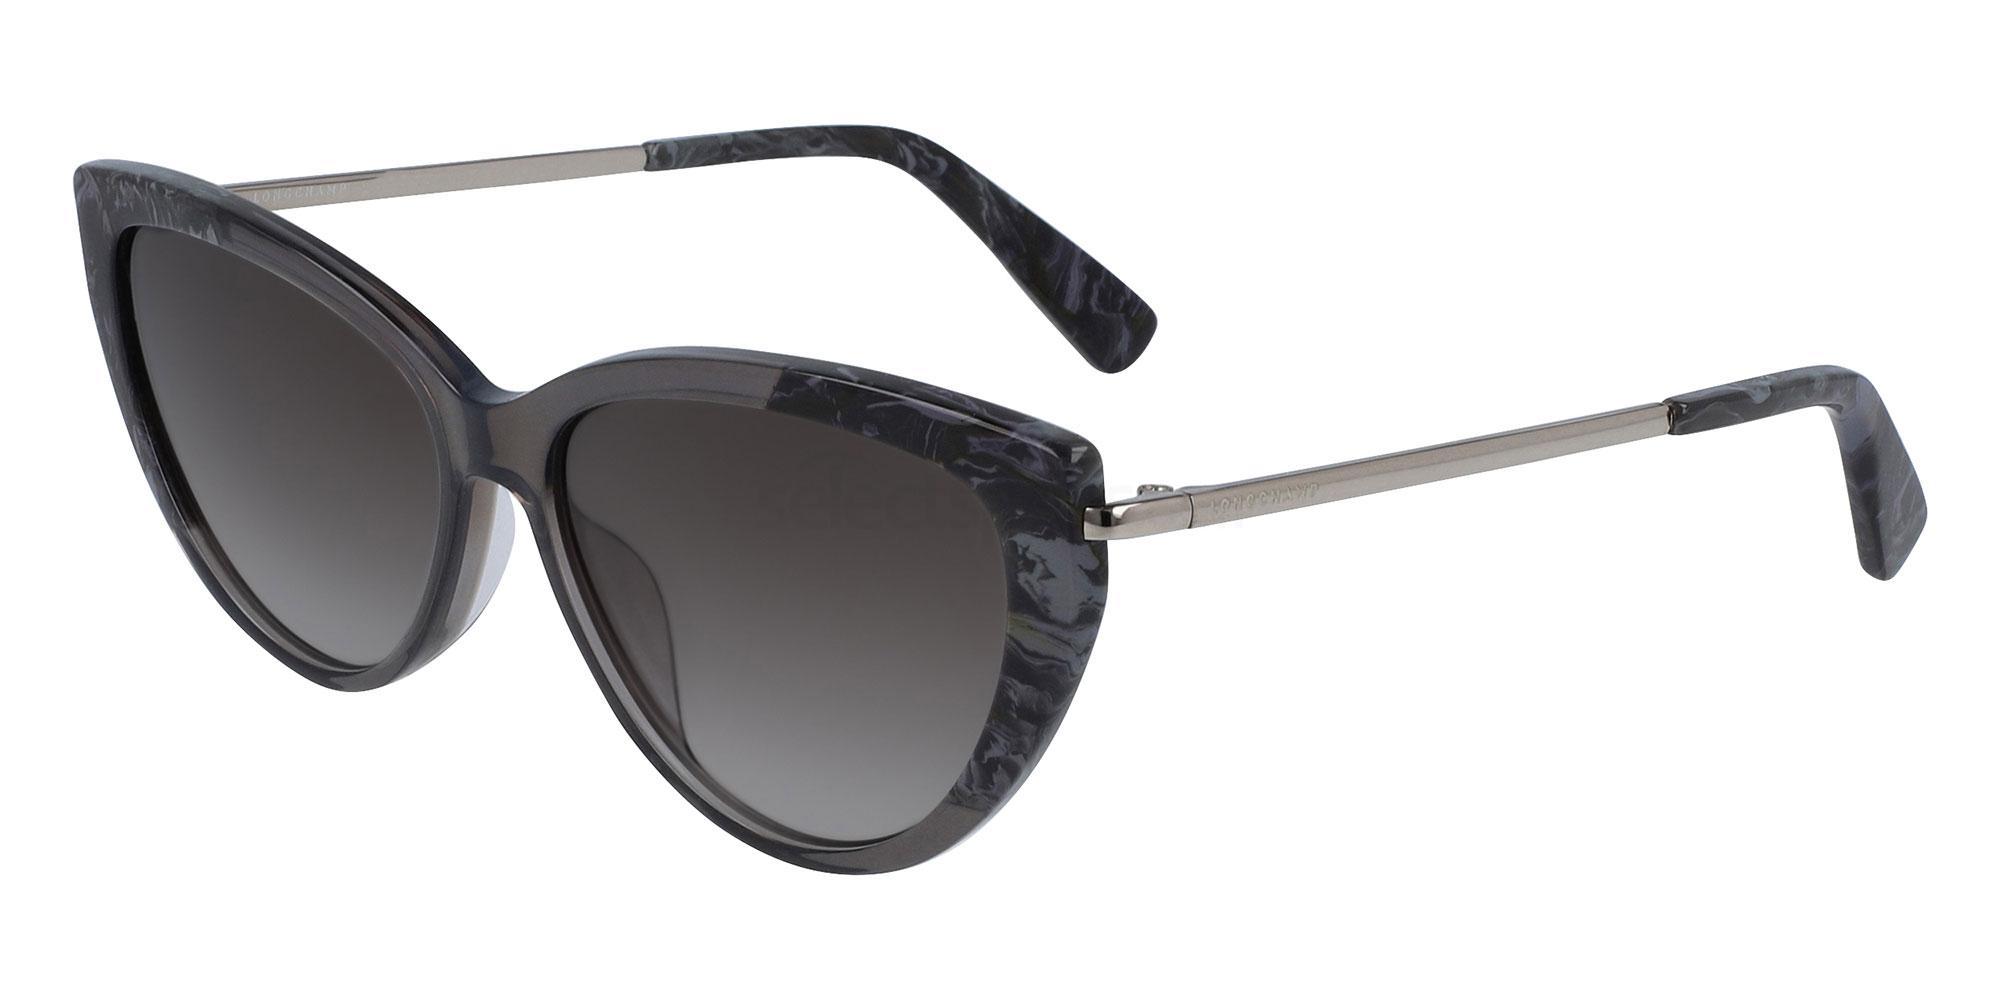 036 LO637S Sunglasses, LONGCHAMP